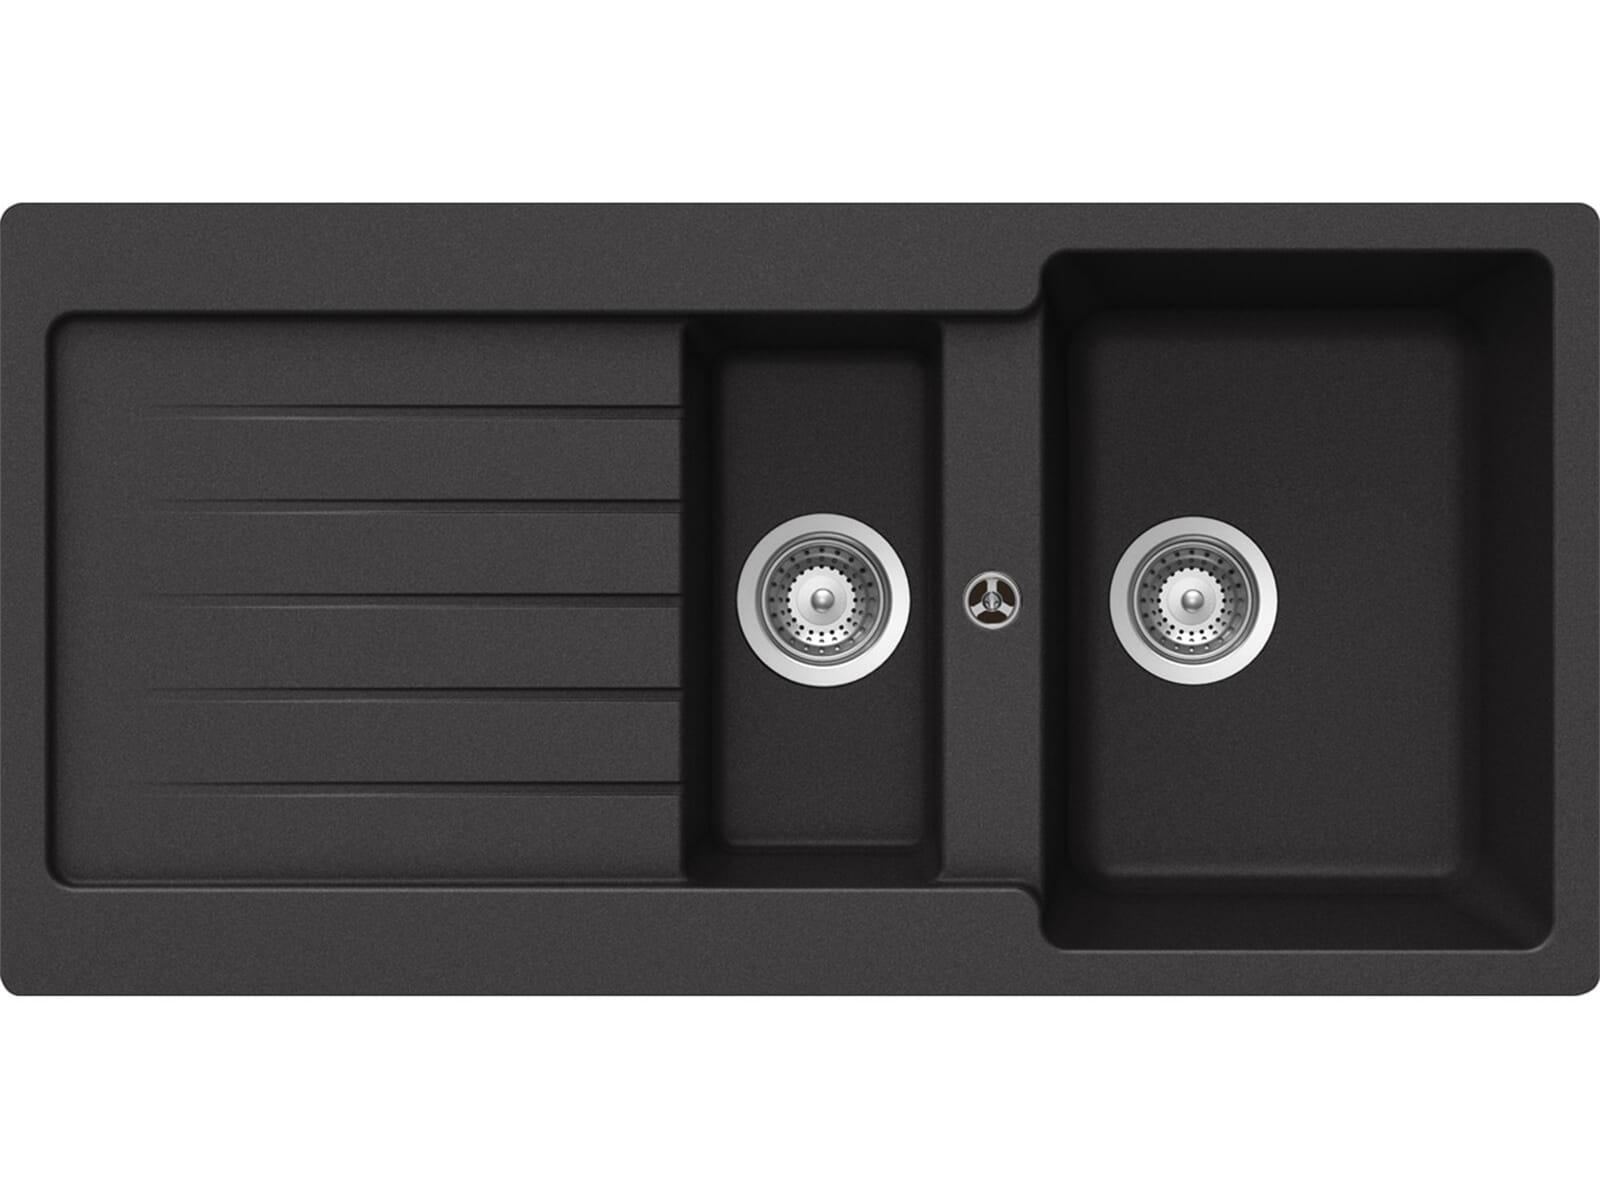 schock typos d 150 a onyx granit sp le f r 258 70 eur. Black Bedroom Furniture Sets. Home Design Ideas